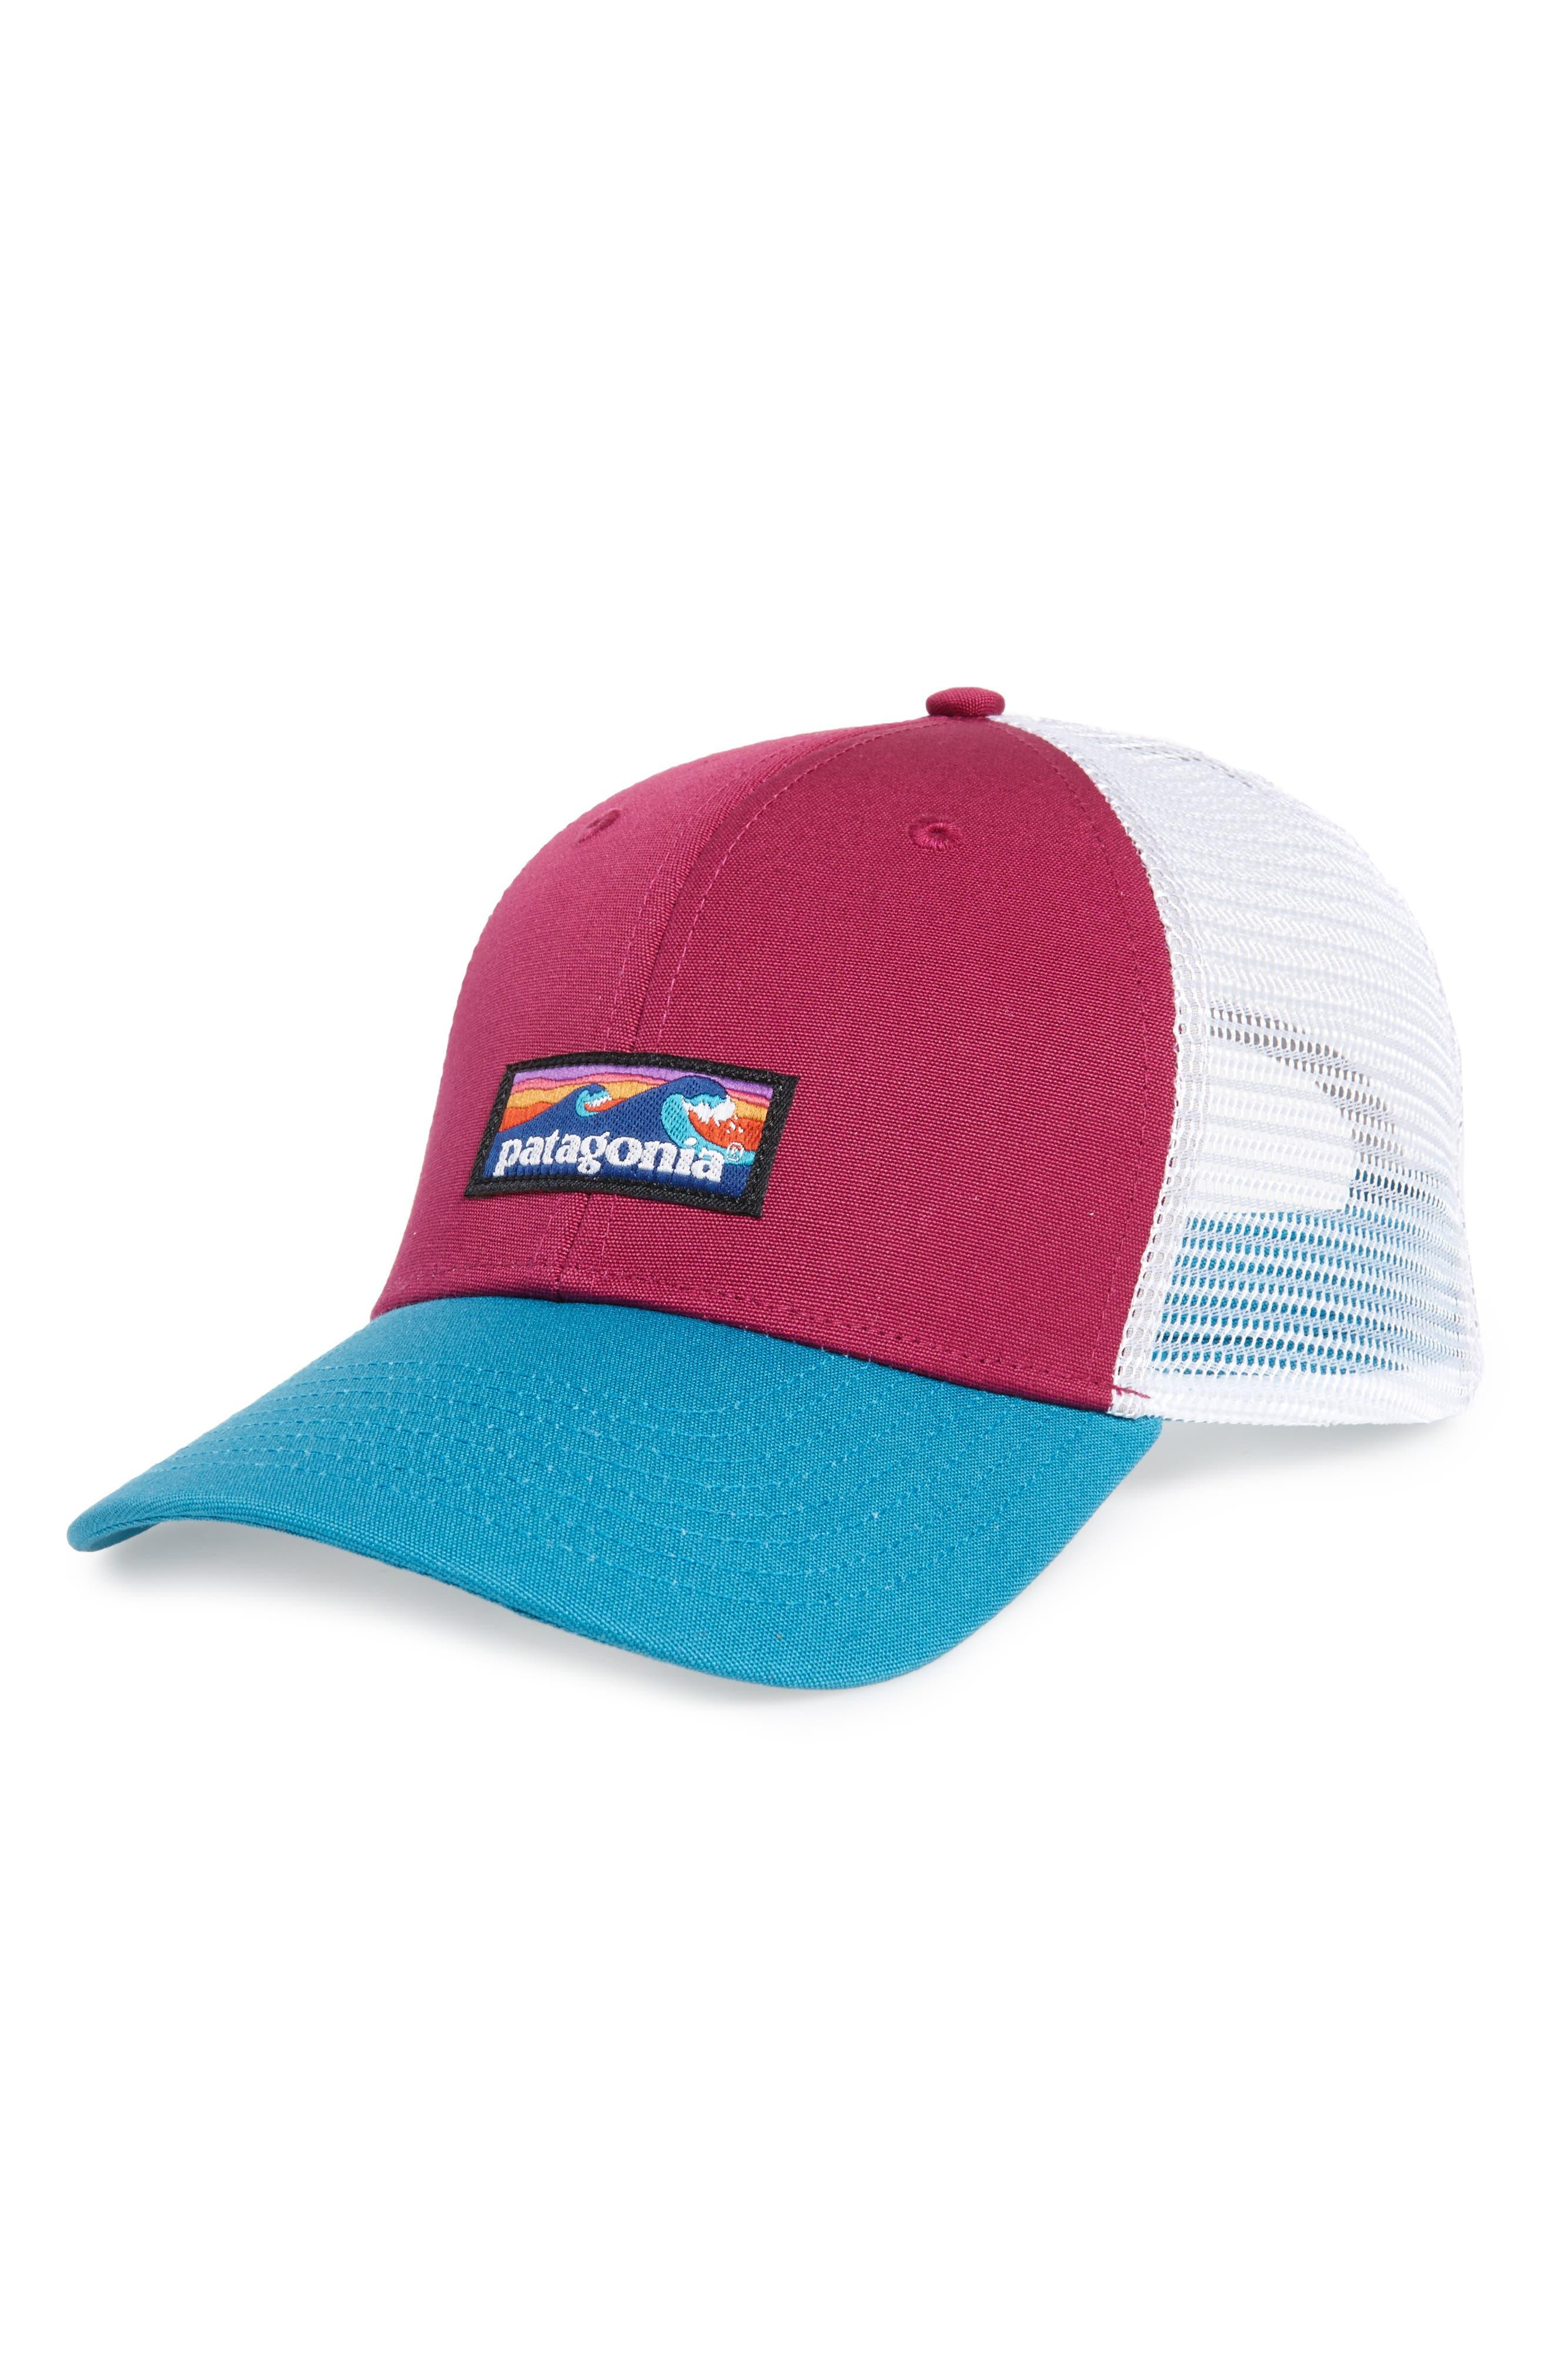 Main Image - Patagonia Board Short Trucker Hat